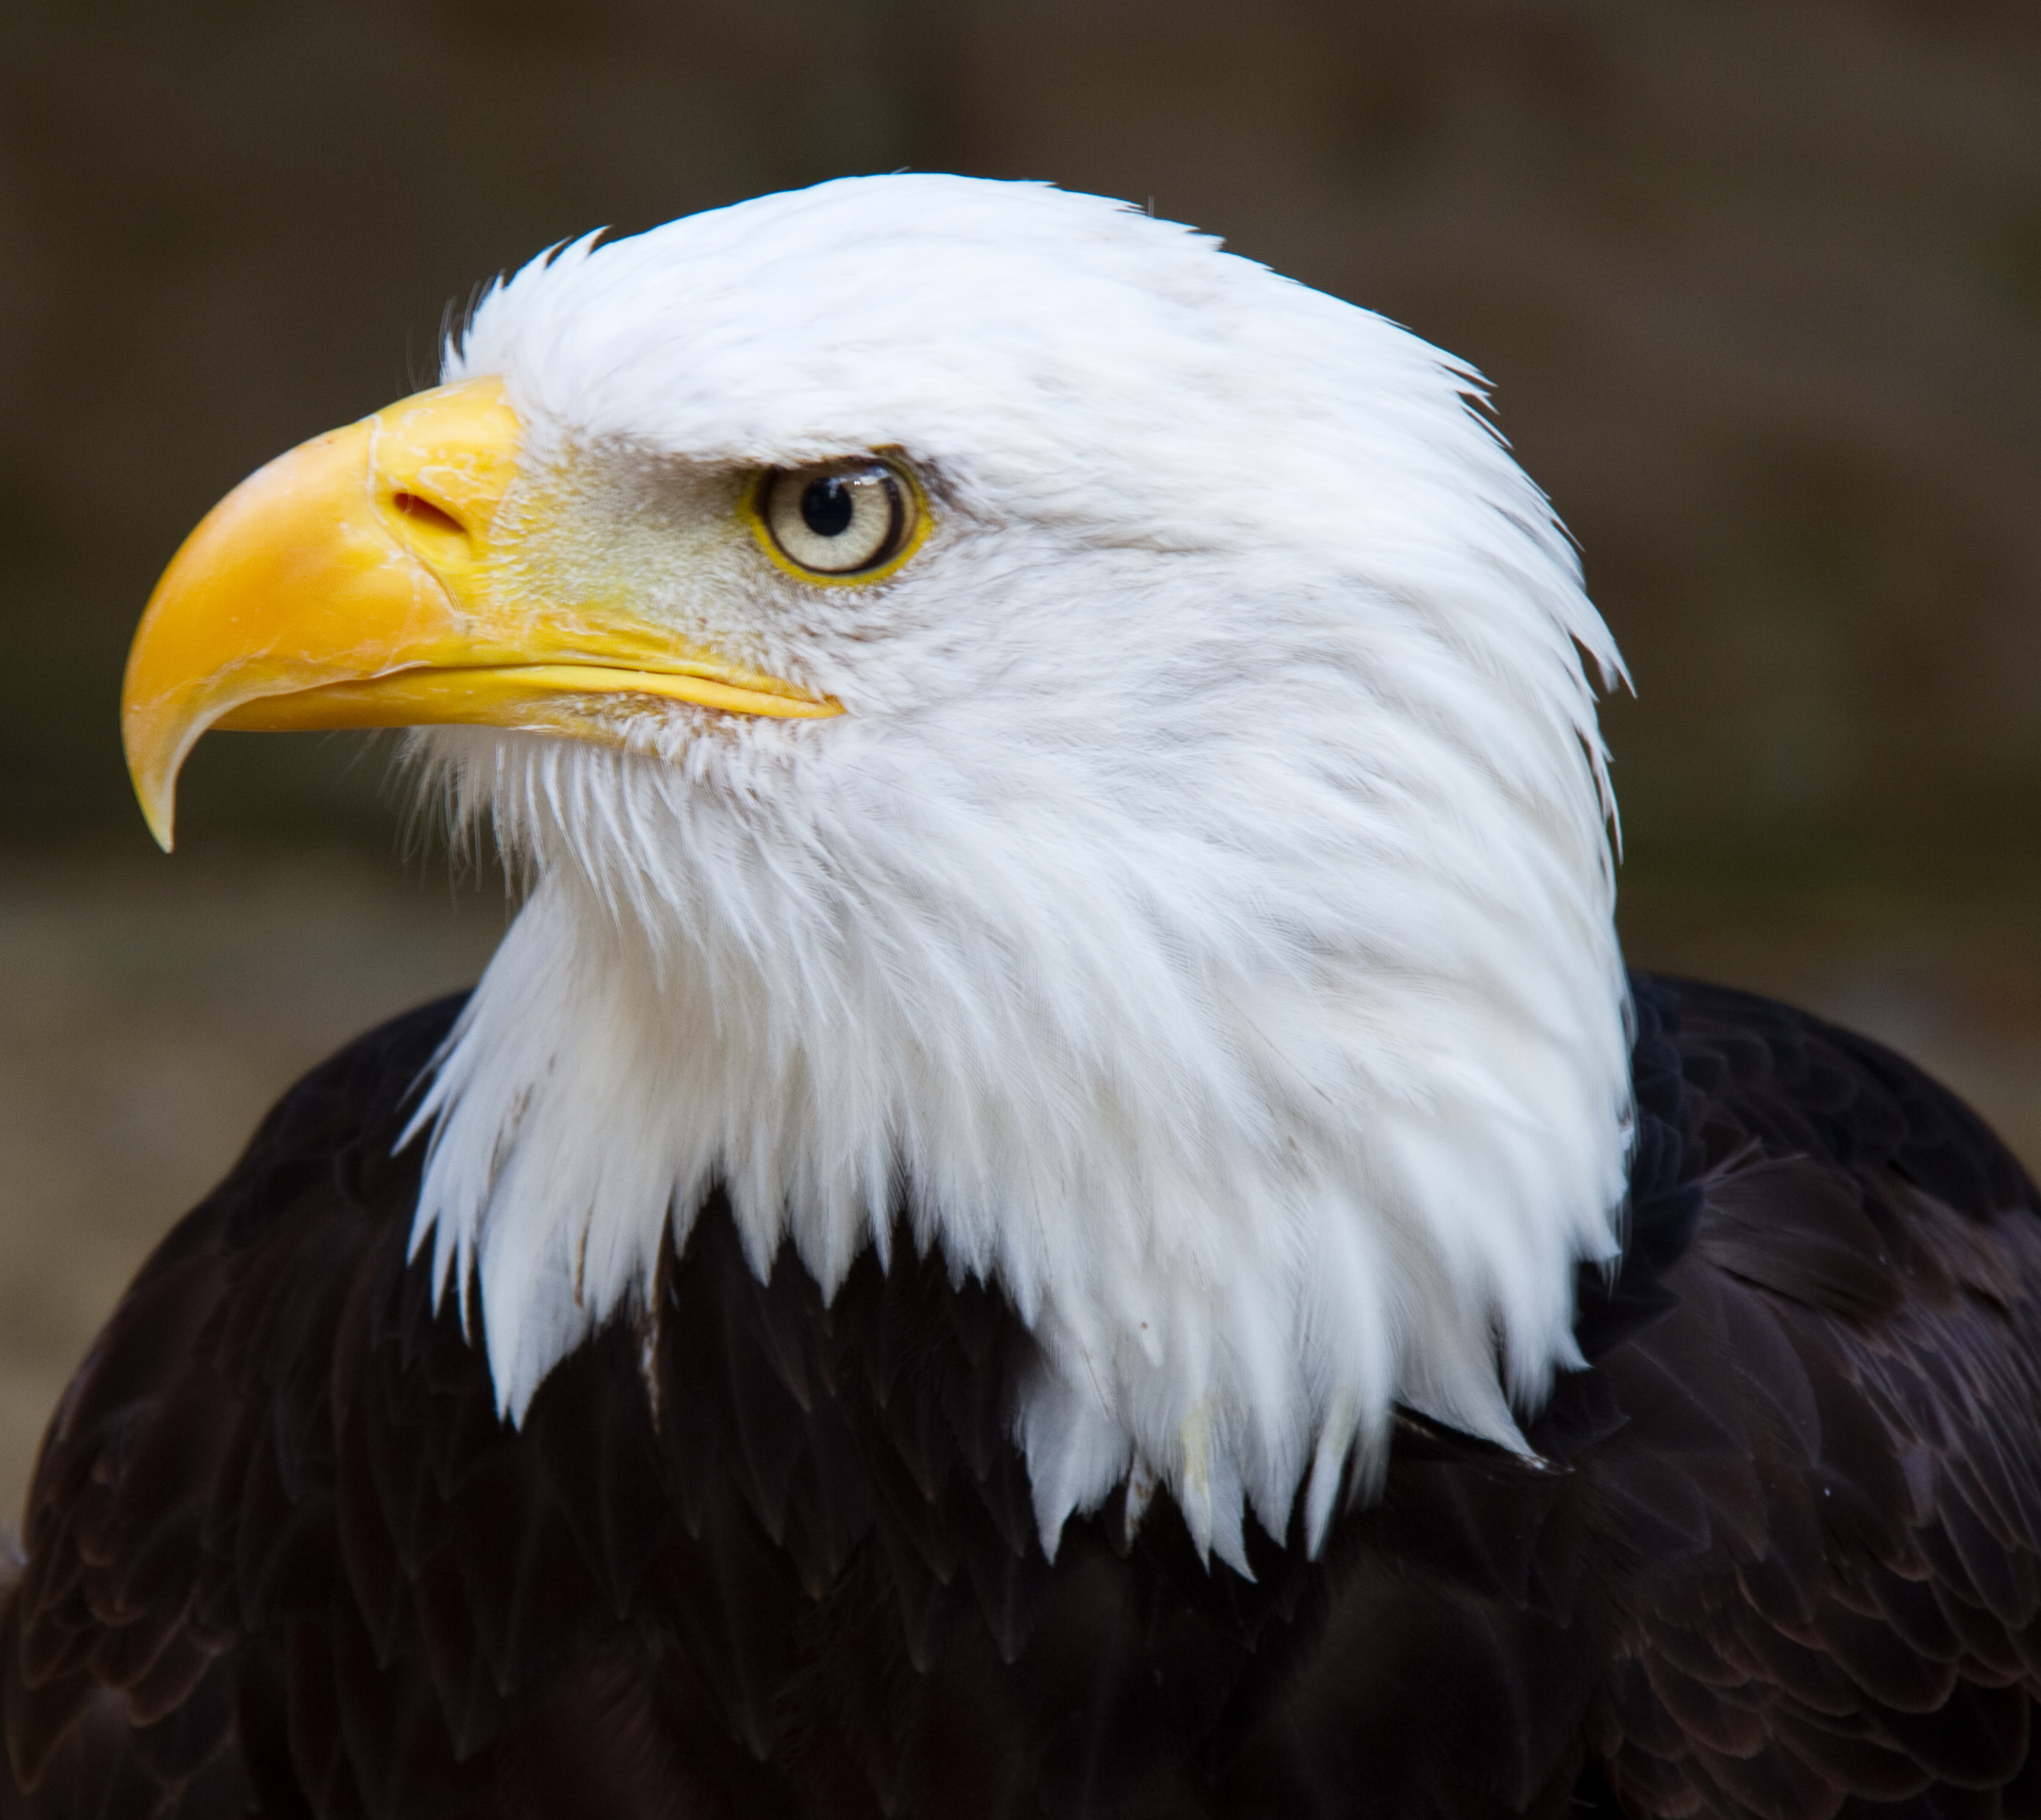 Bald eagle head front - photo#18